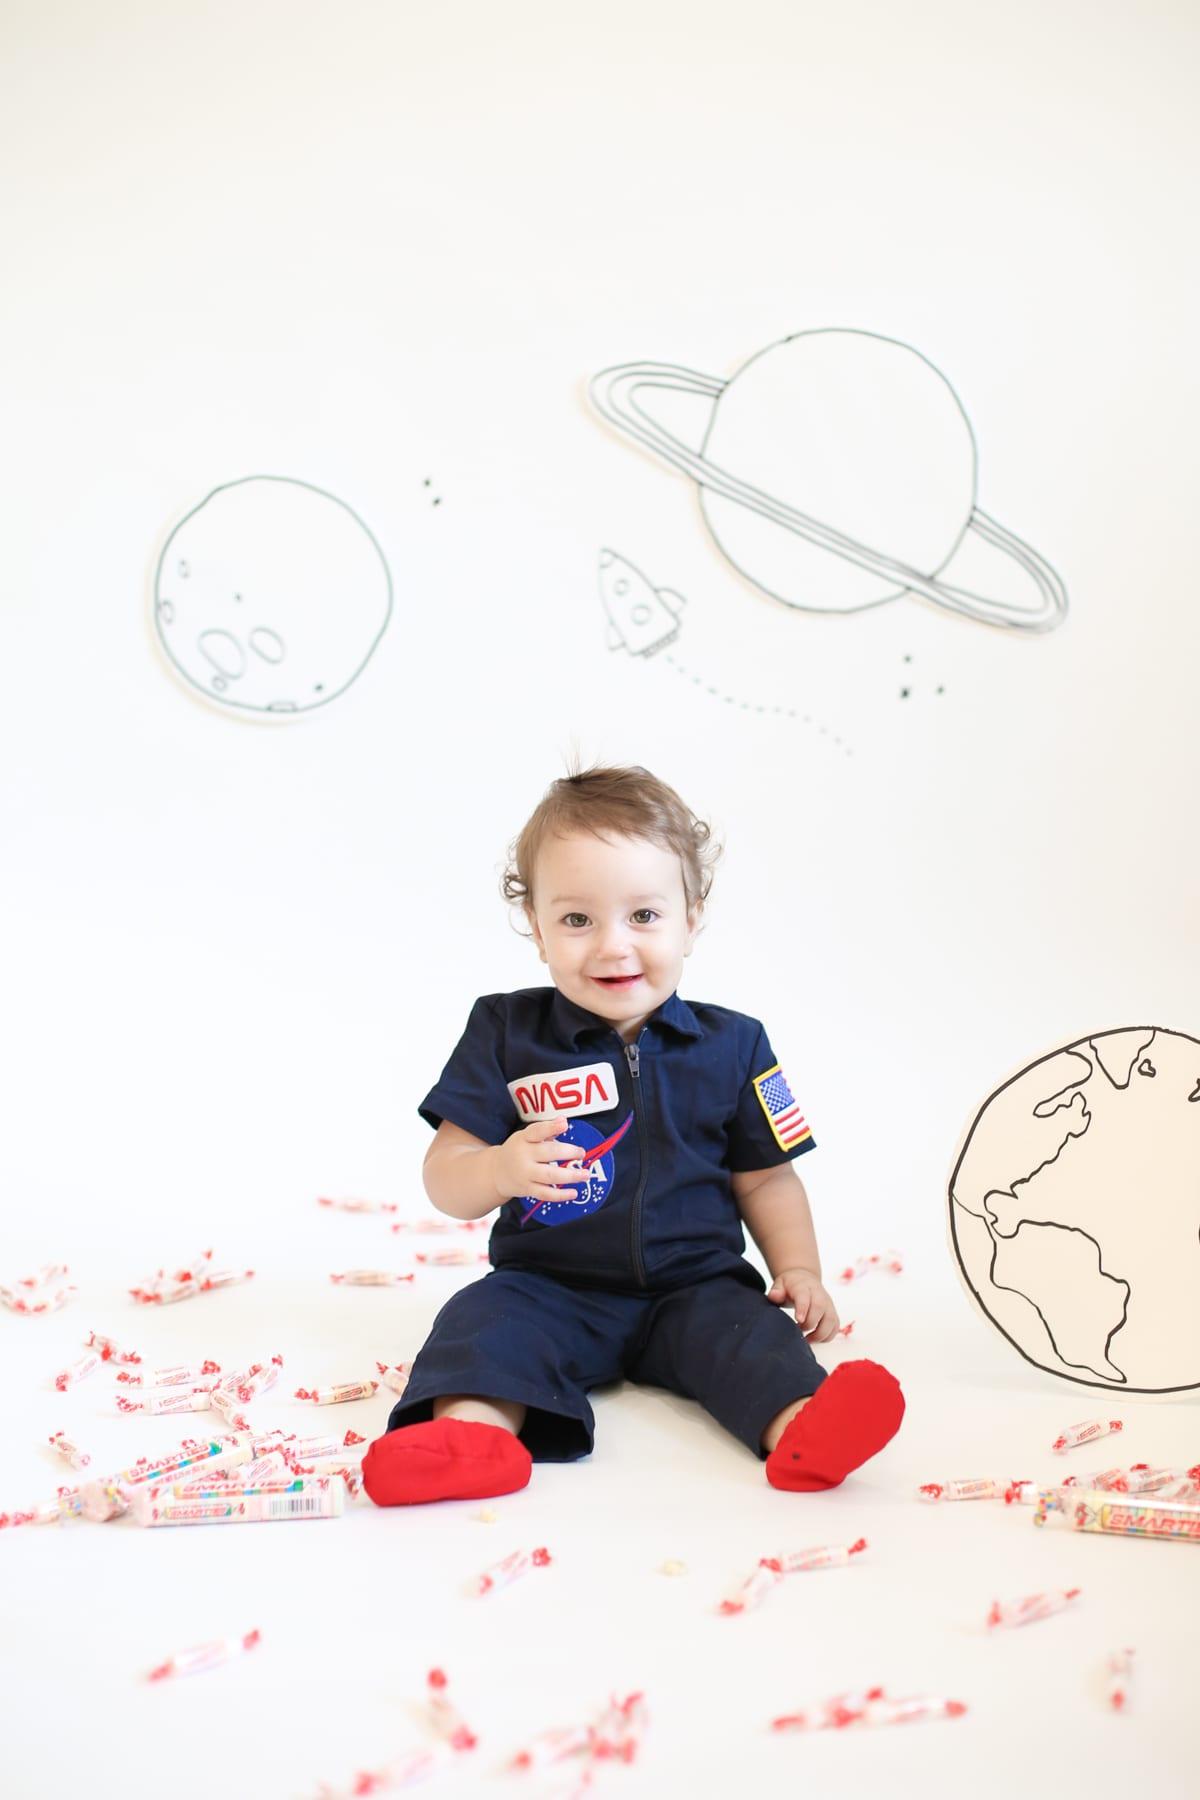 Baby astronaut costume for Halloween